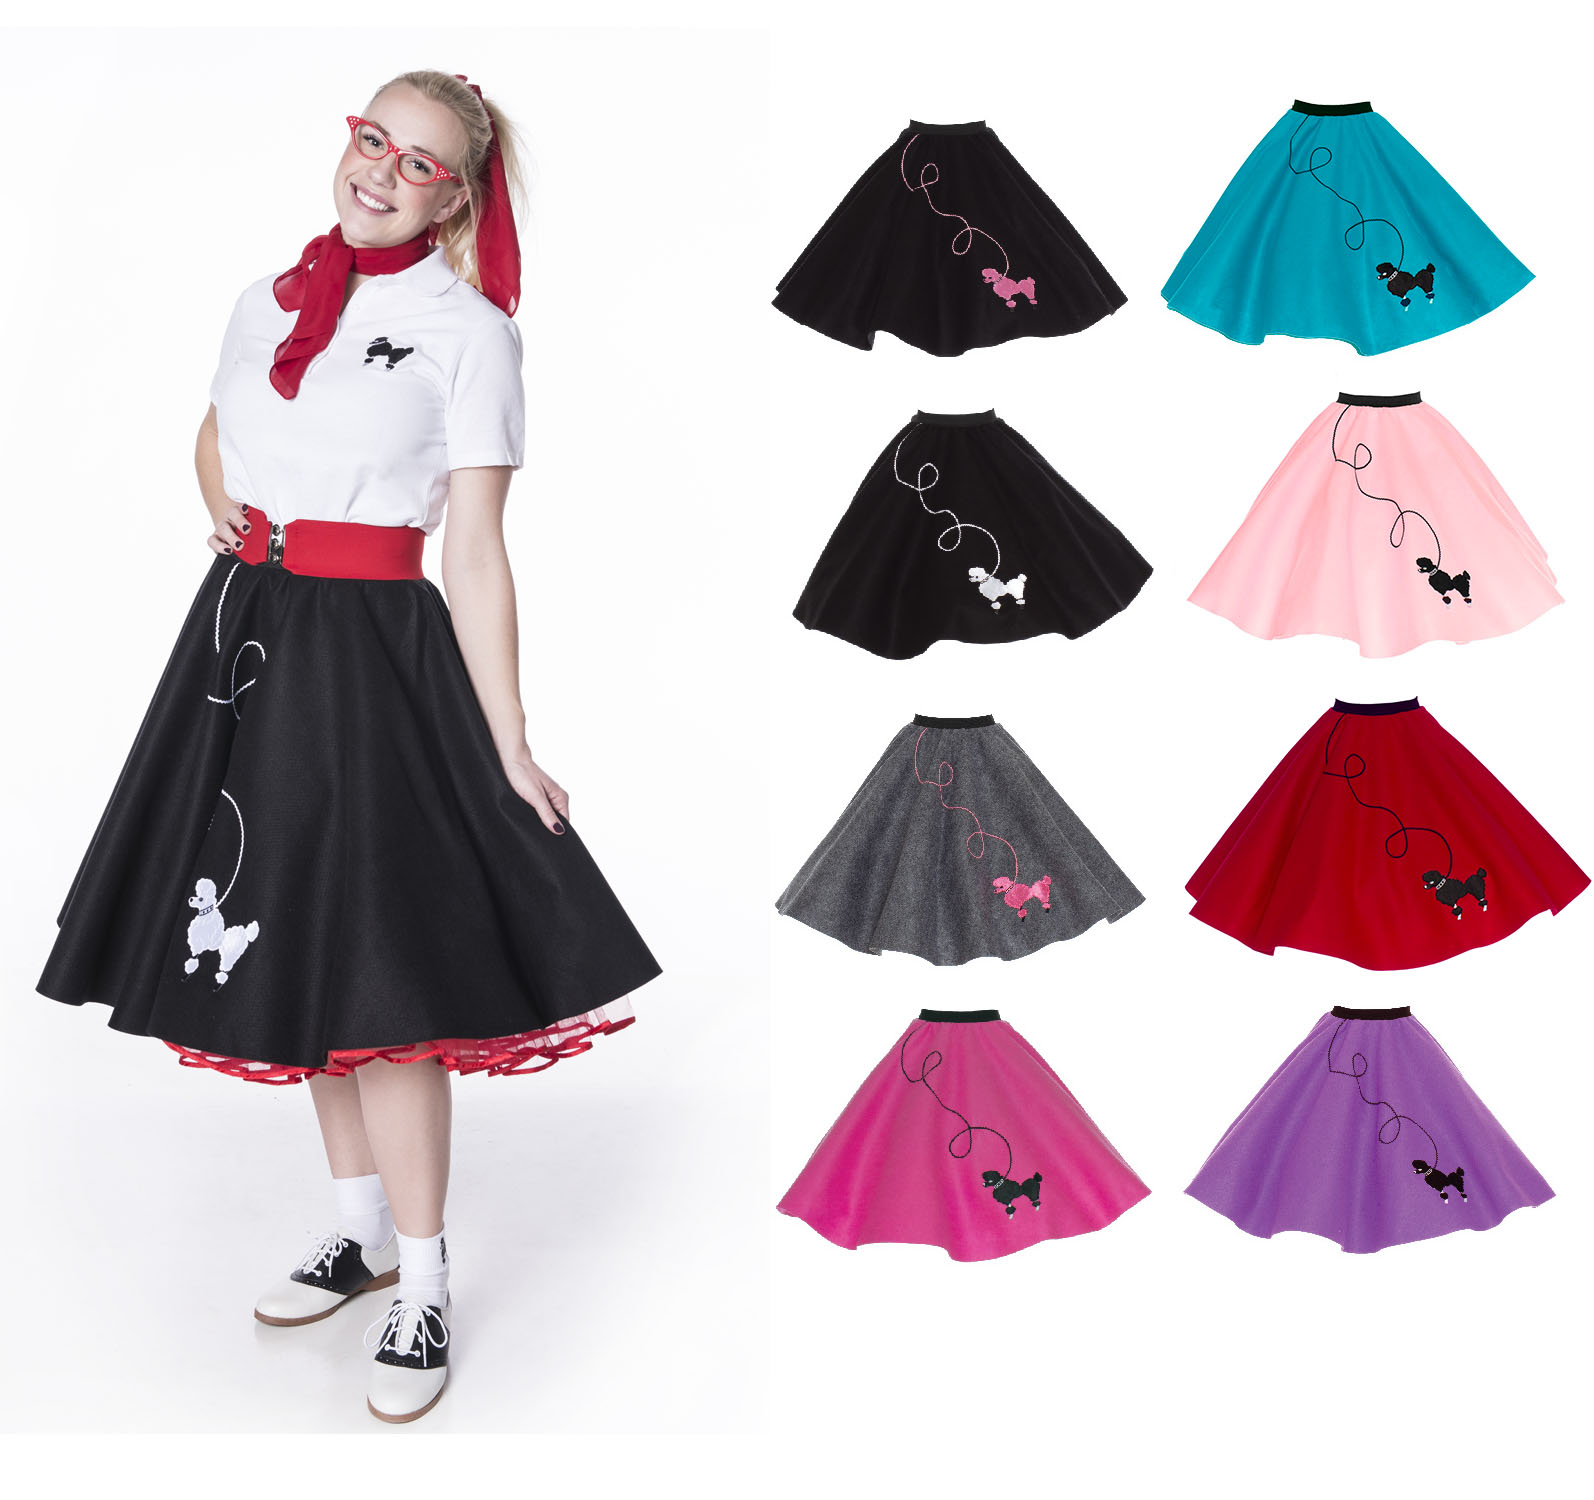 White 50/'s Poodle Shirt Costume Top Sock Hop Style Dance Blouse Women/'s Adult